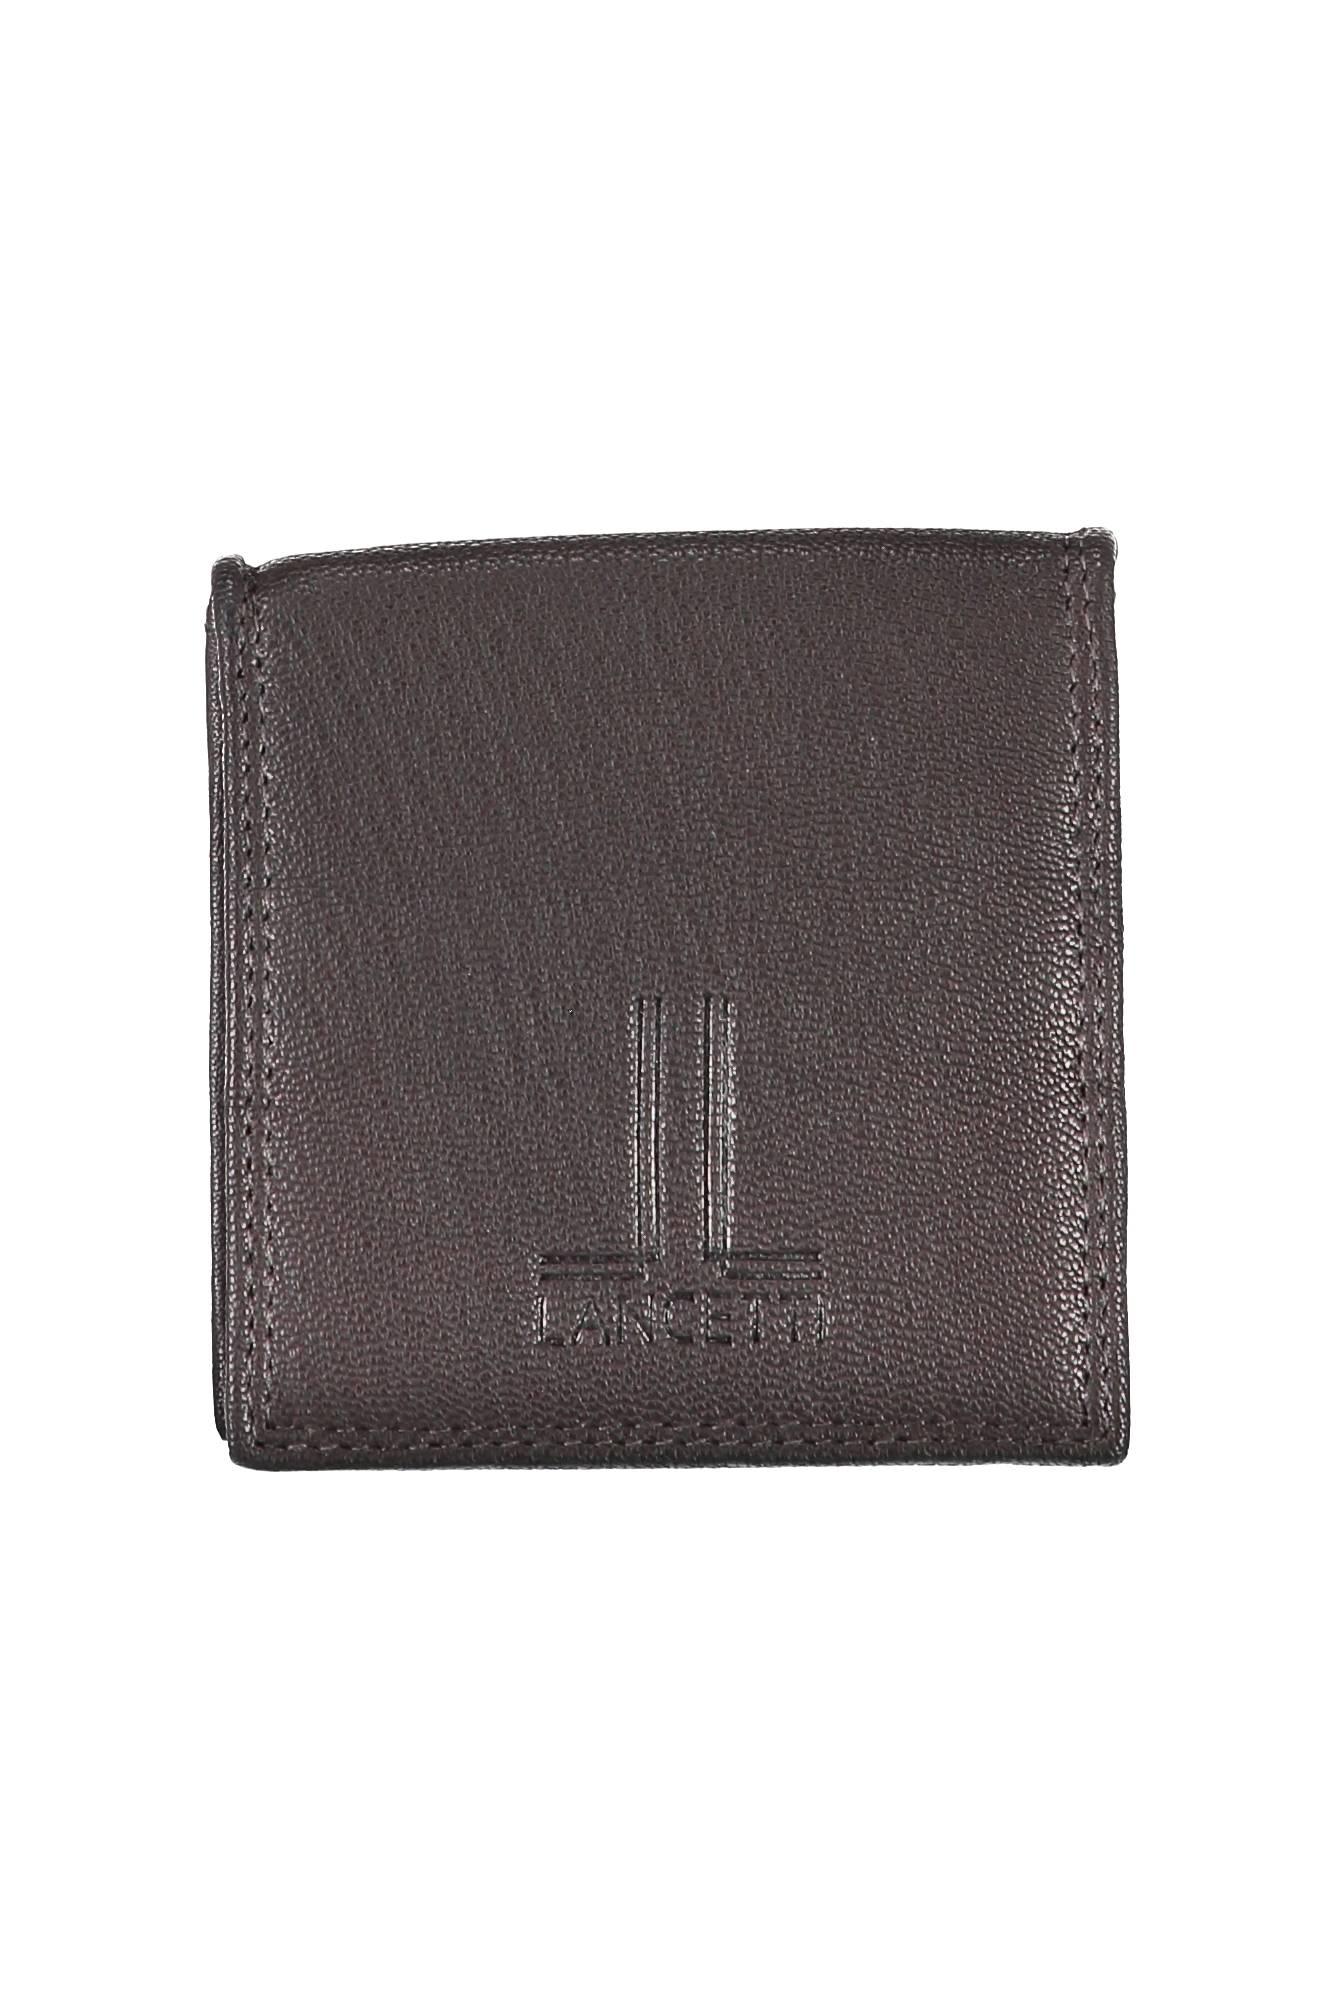 LANCETTI peněženka MARRONE